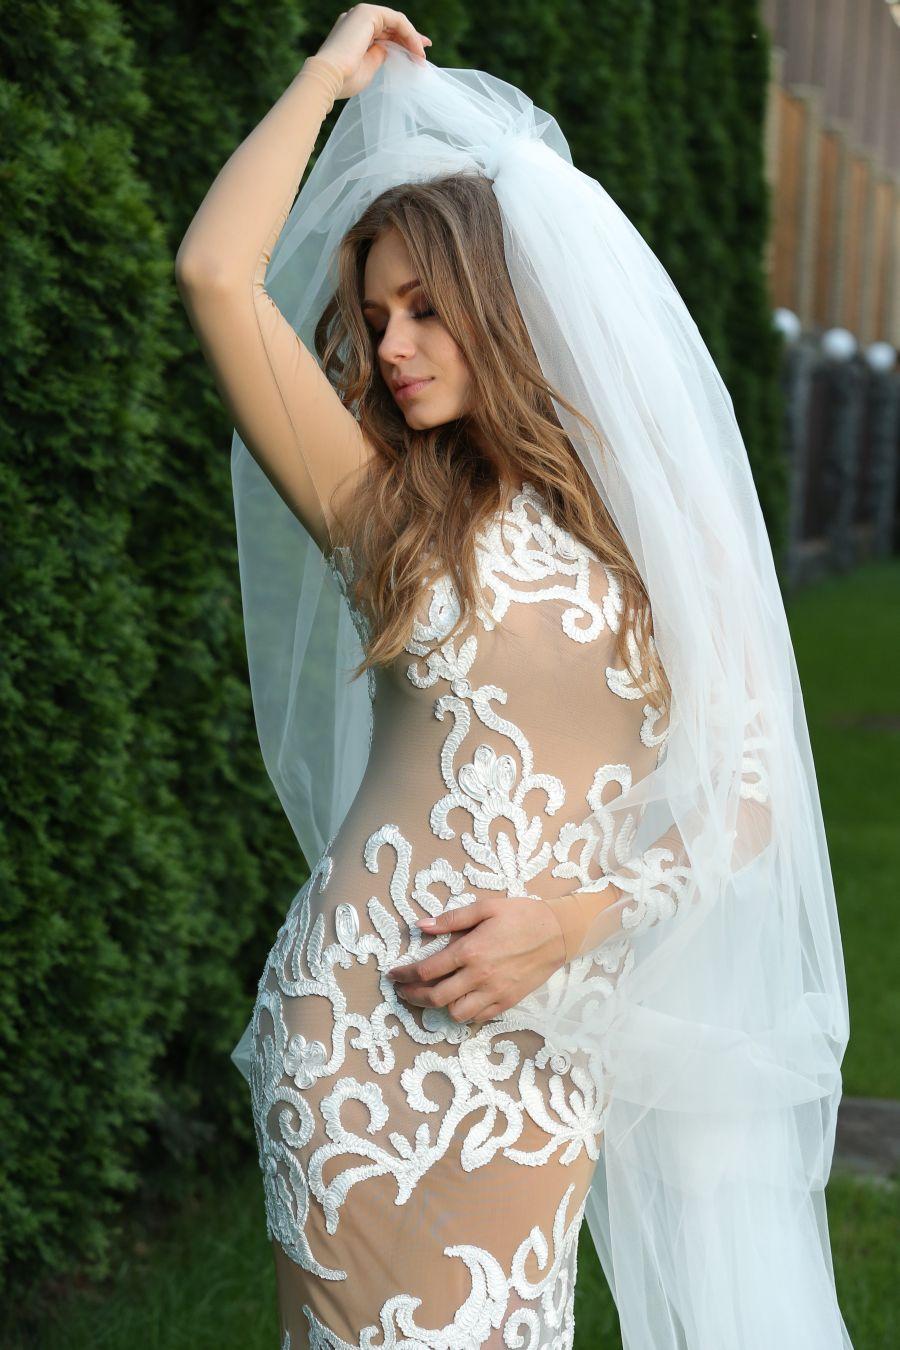 Яна Соломко вышла замуж